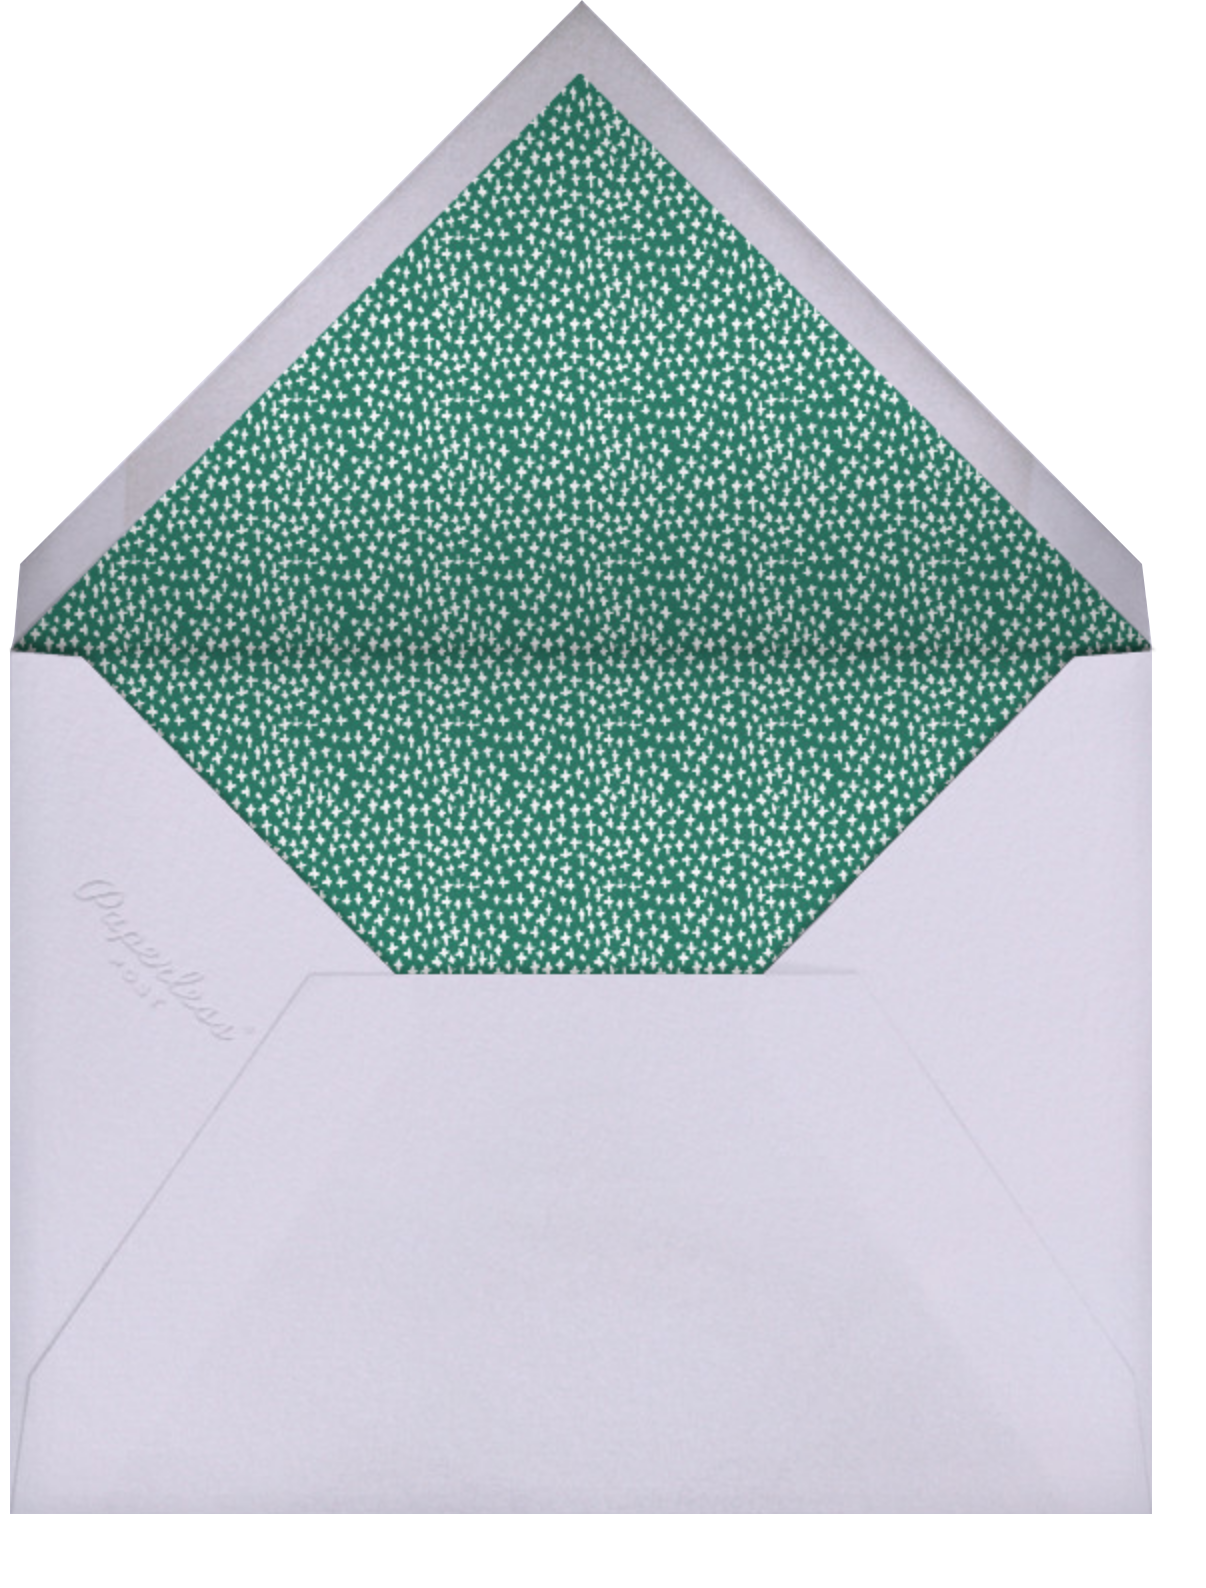 Miss Ivy - Mr. Boddington's Studio - Baby shower - envelope back